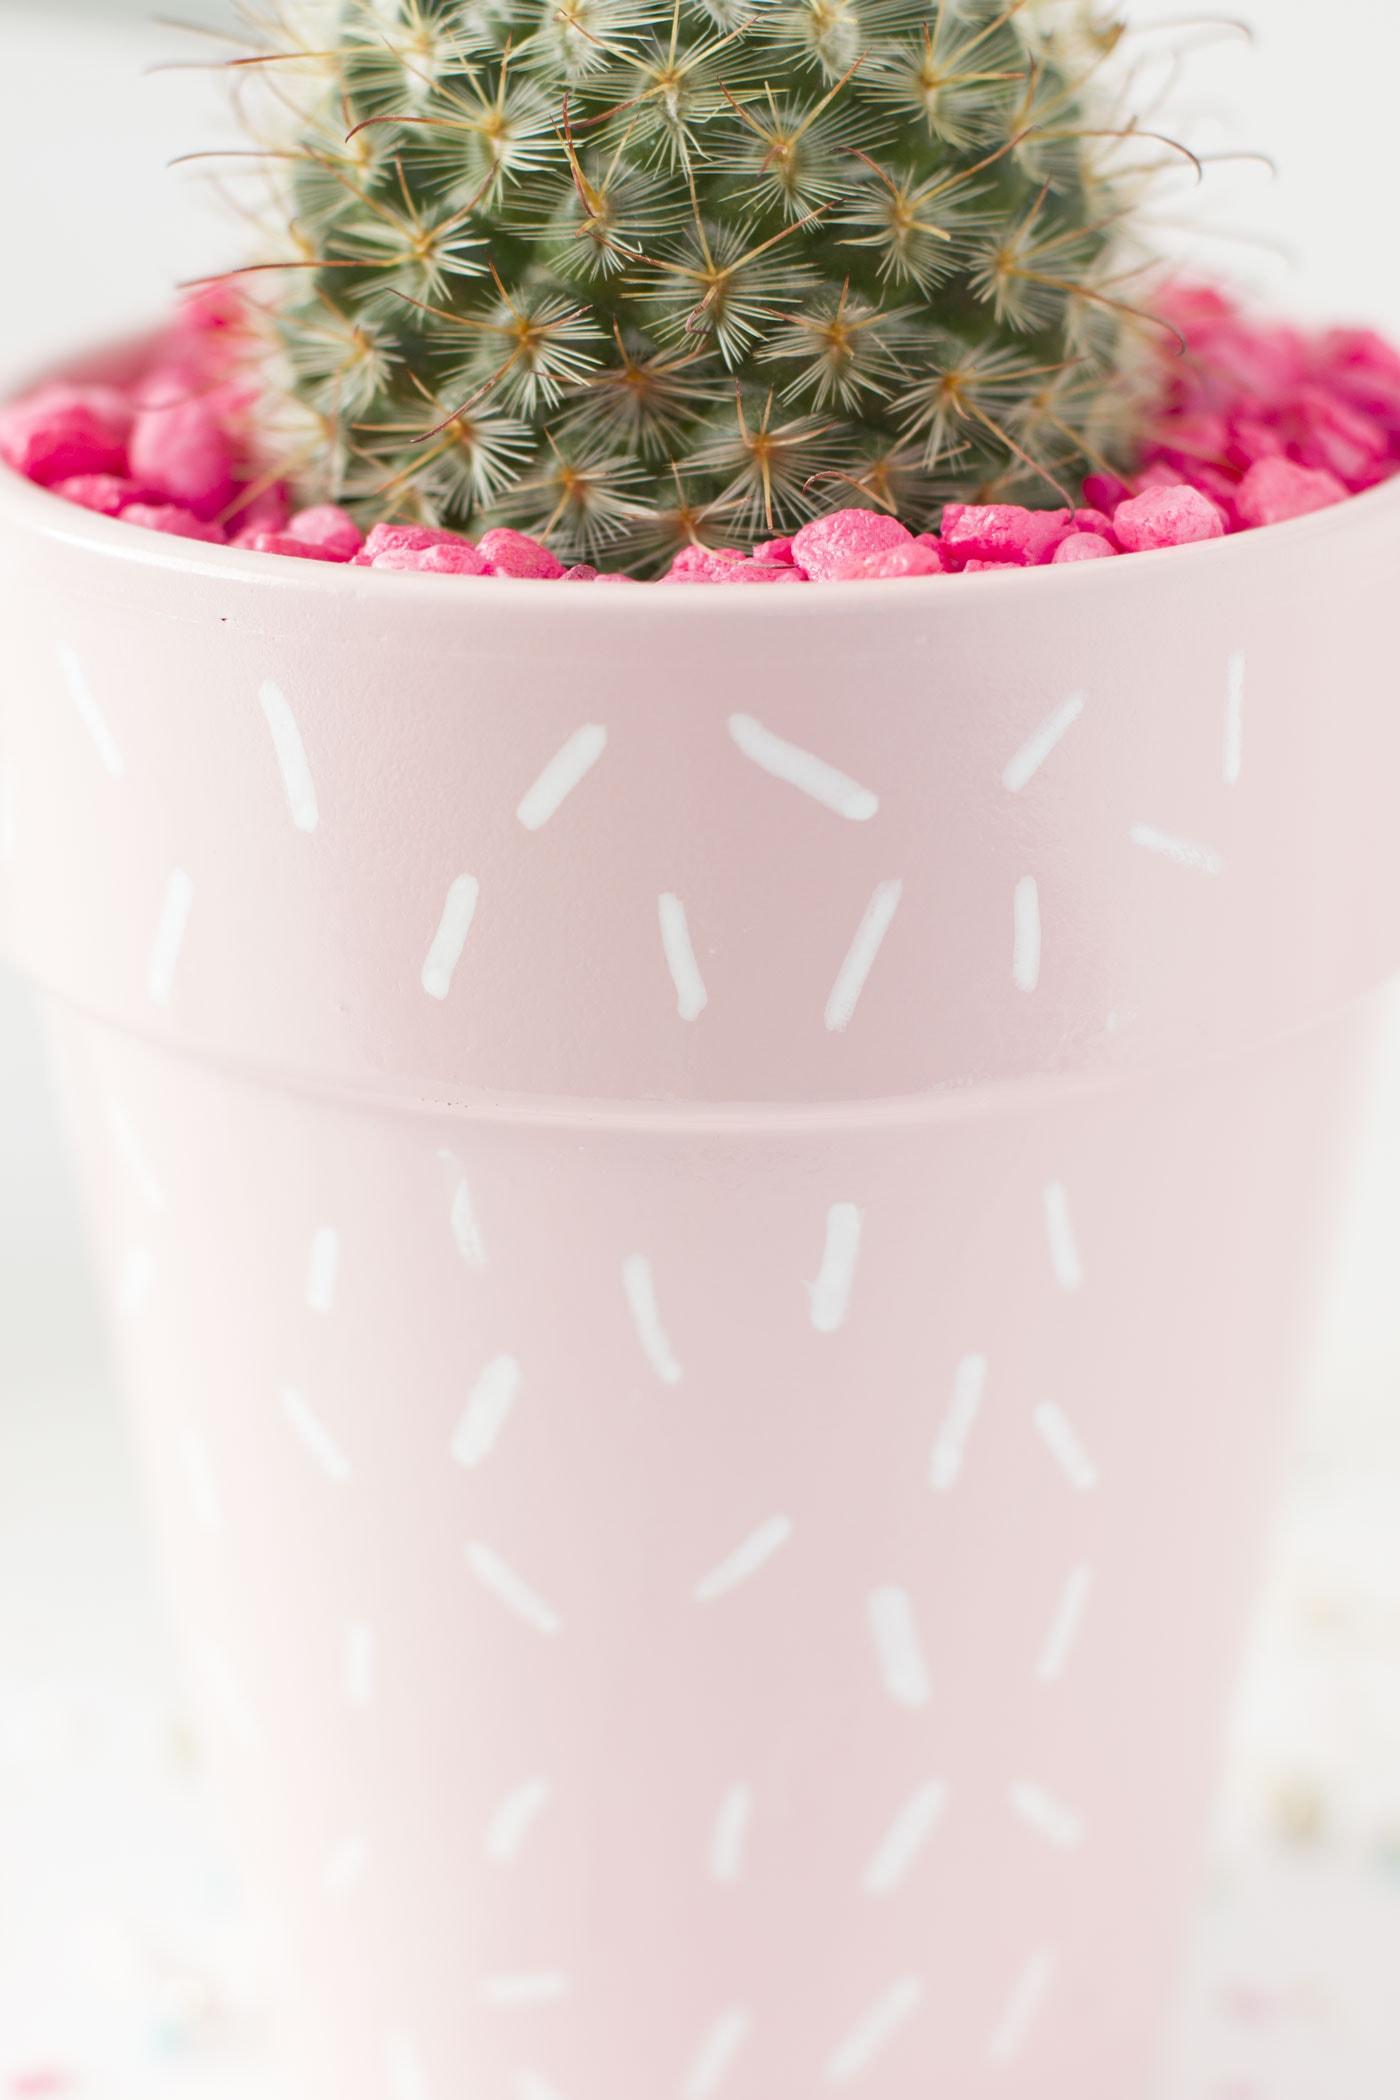 cactus-planter-diy-sprinkle-pink-chic-cute